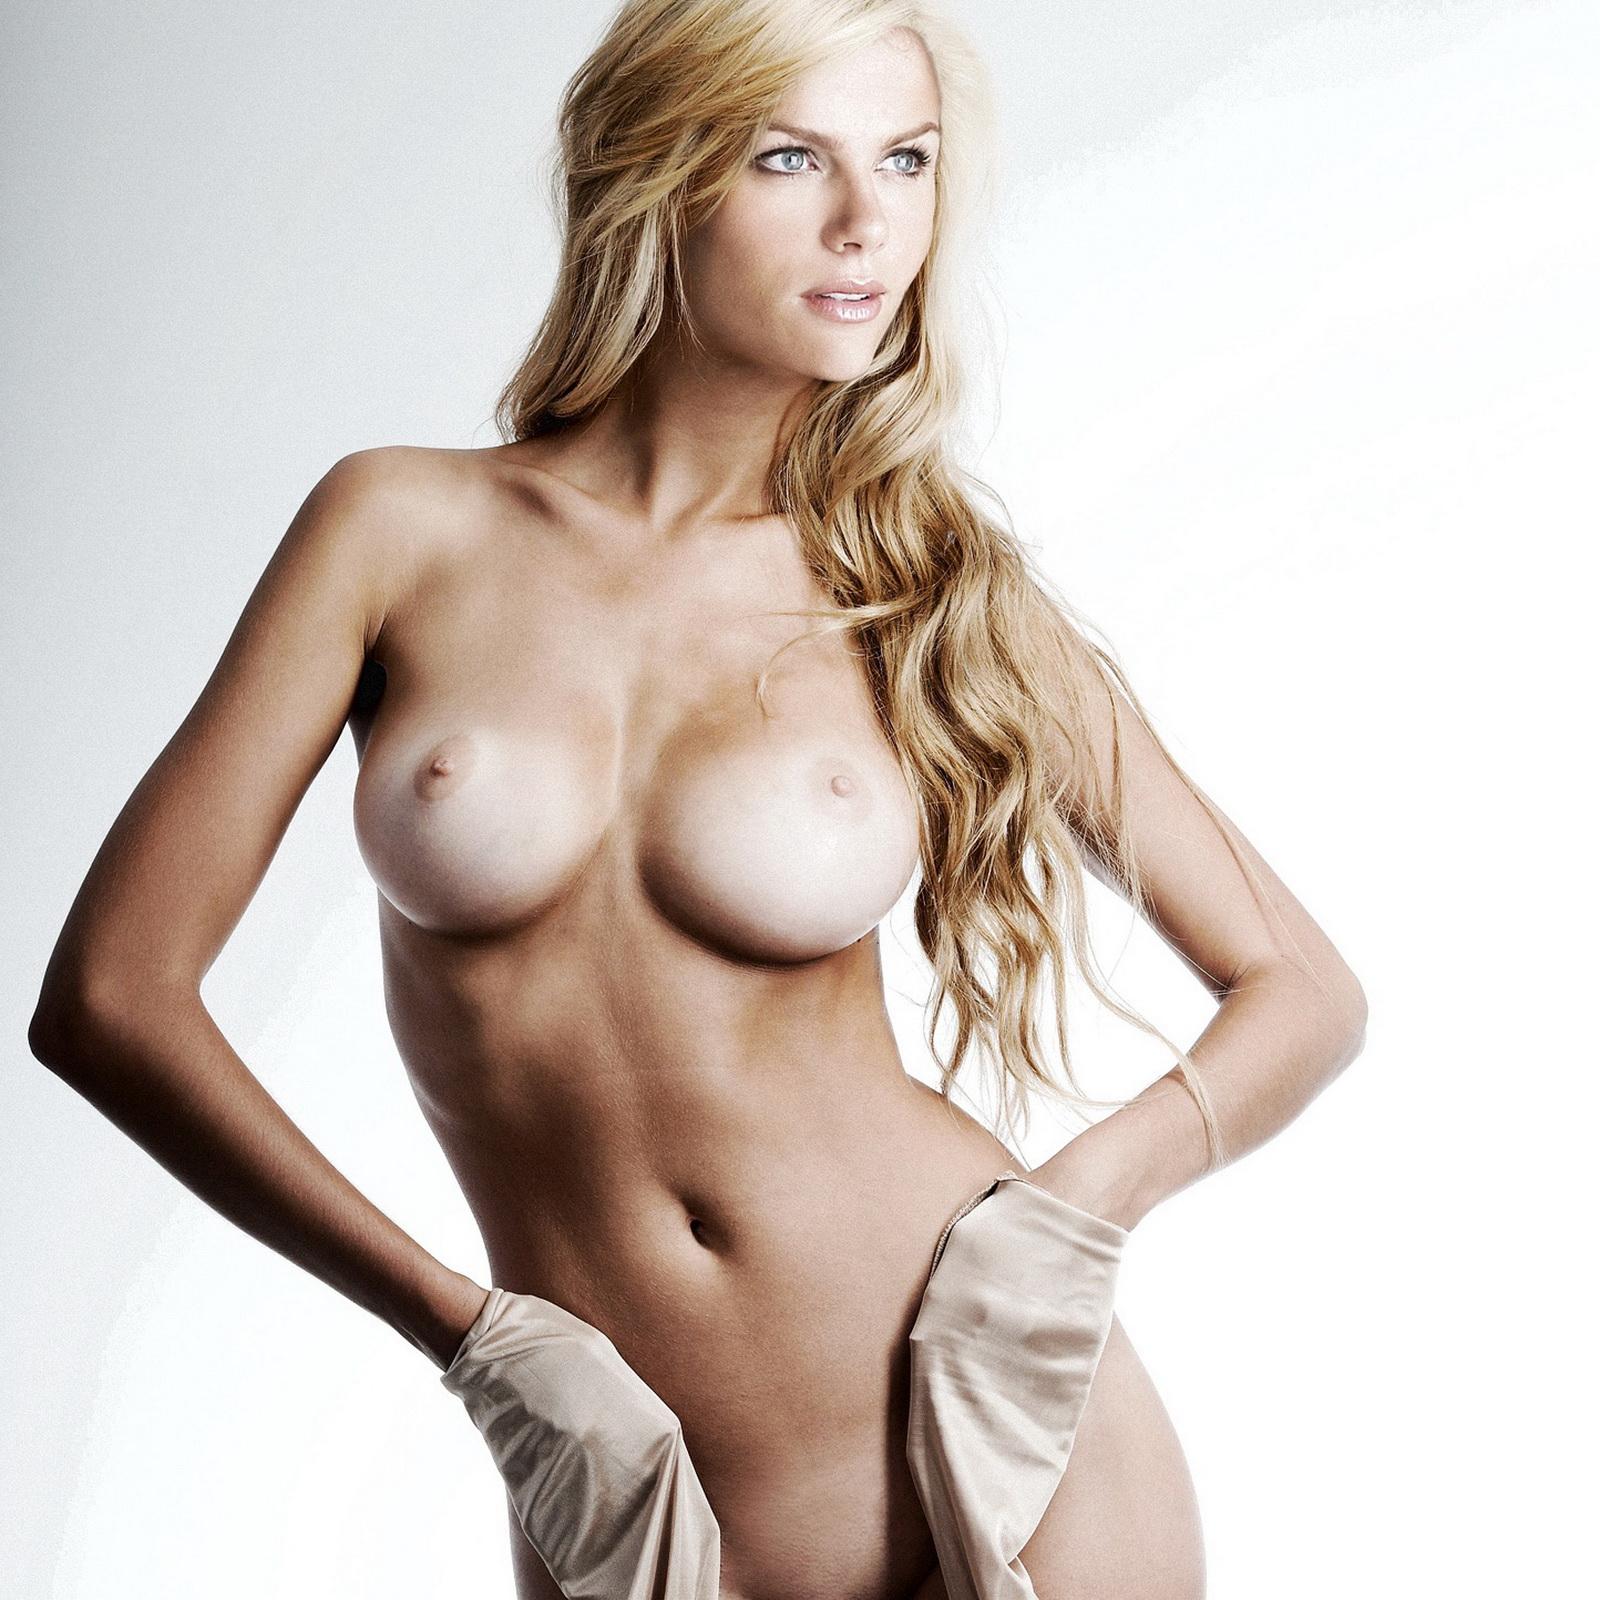 http://1.bp.blogspot.com/-a9Xco2PDn34/T3F85QuQqLI/AAAAAAAAABs/NkmPtJk701o/s1600/Brooklyn+Decker+nude+SI+photoshoot+UHQ.jpg